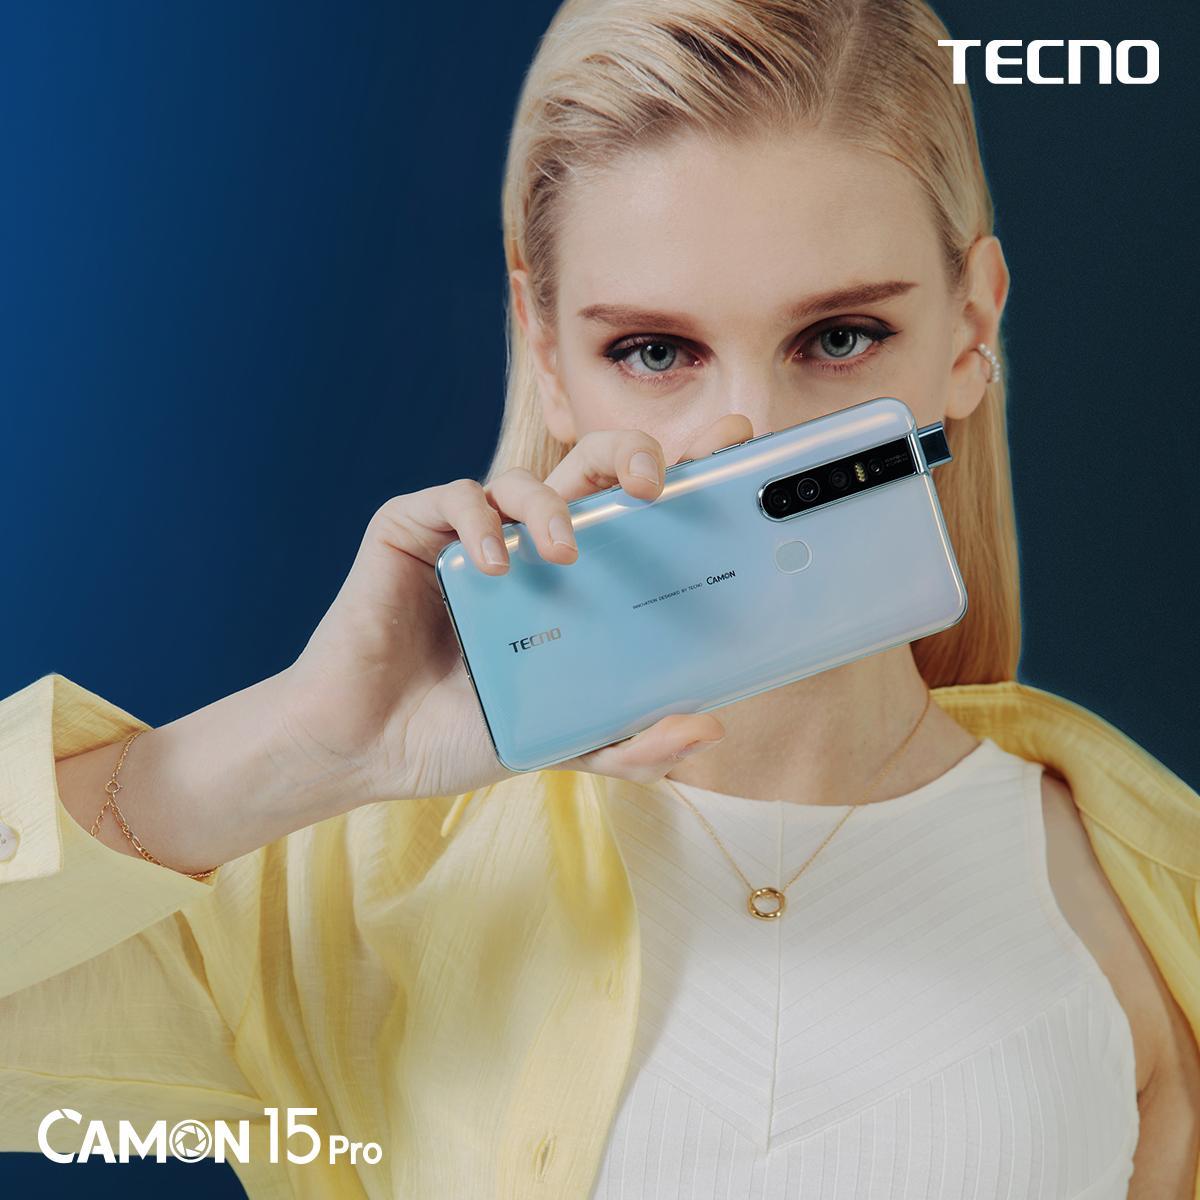 Смартфон Tecno CAMON 15 Pro пошёл впродажу